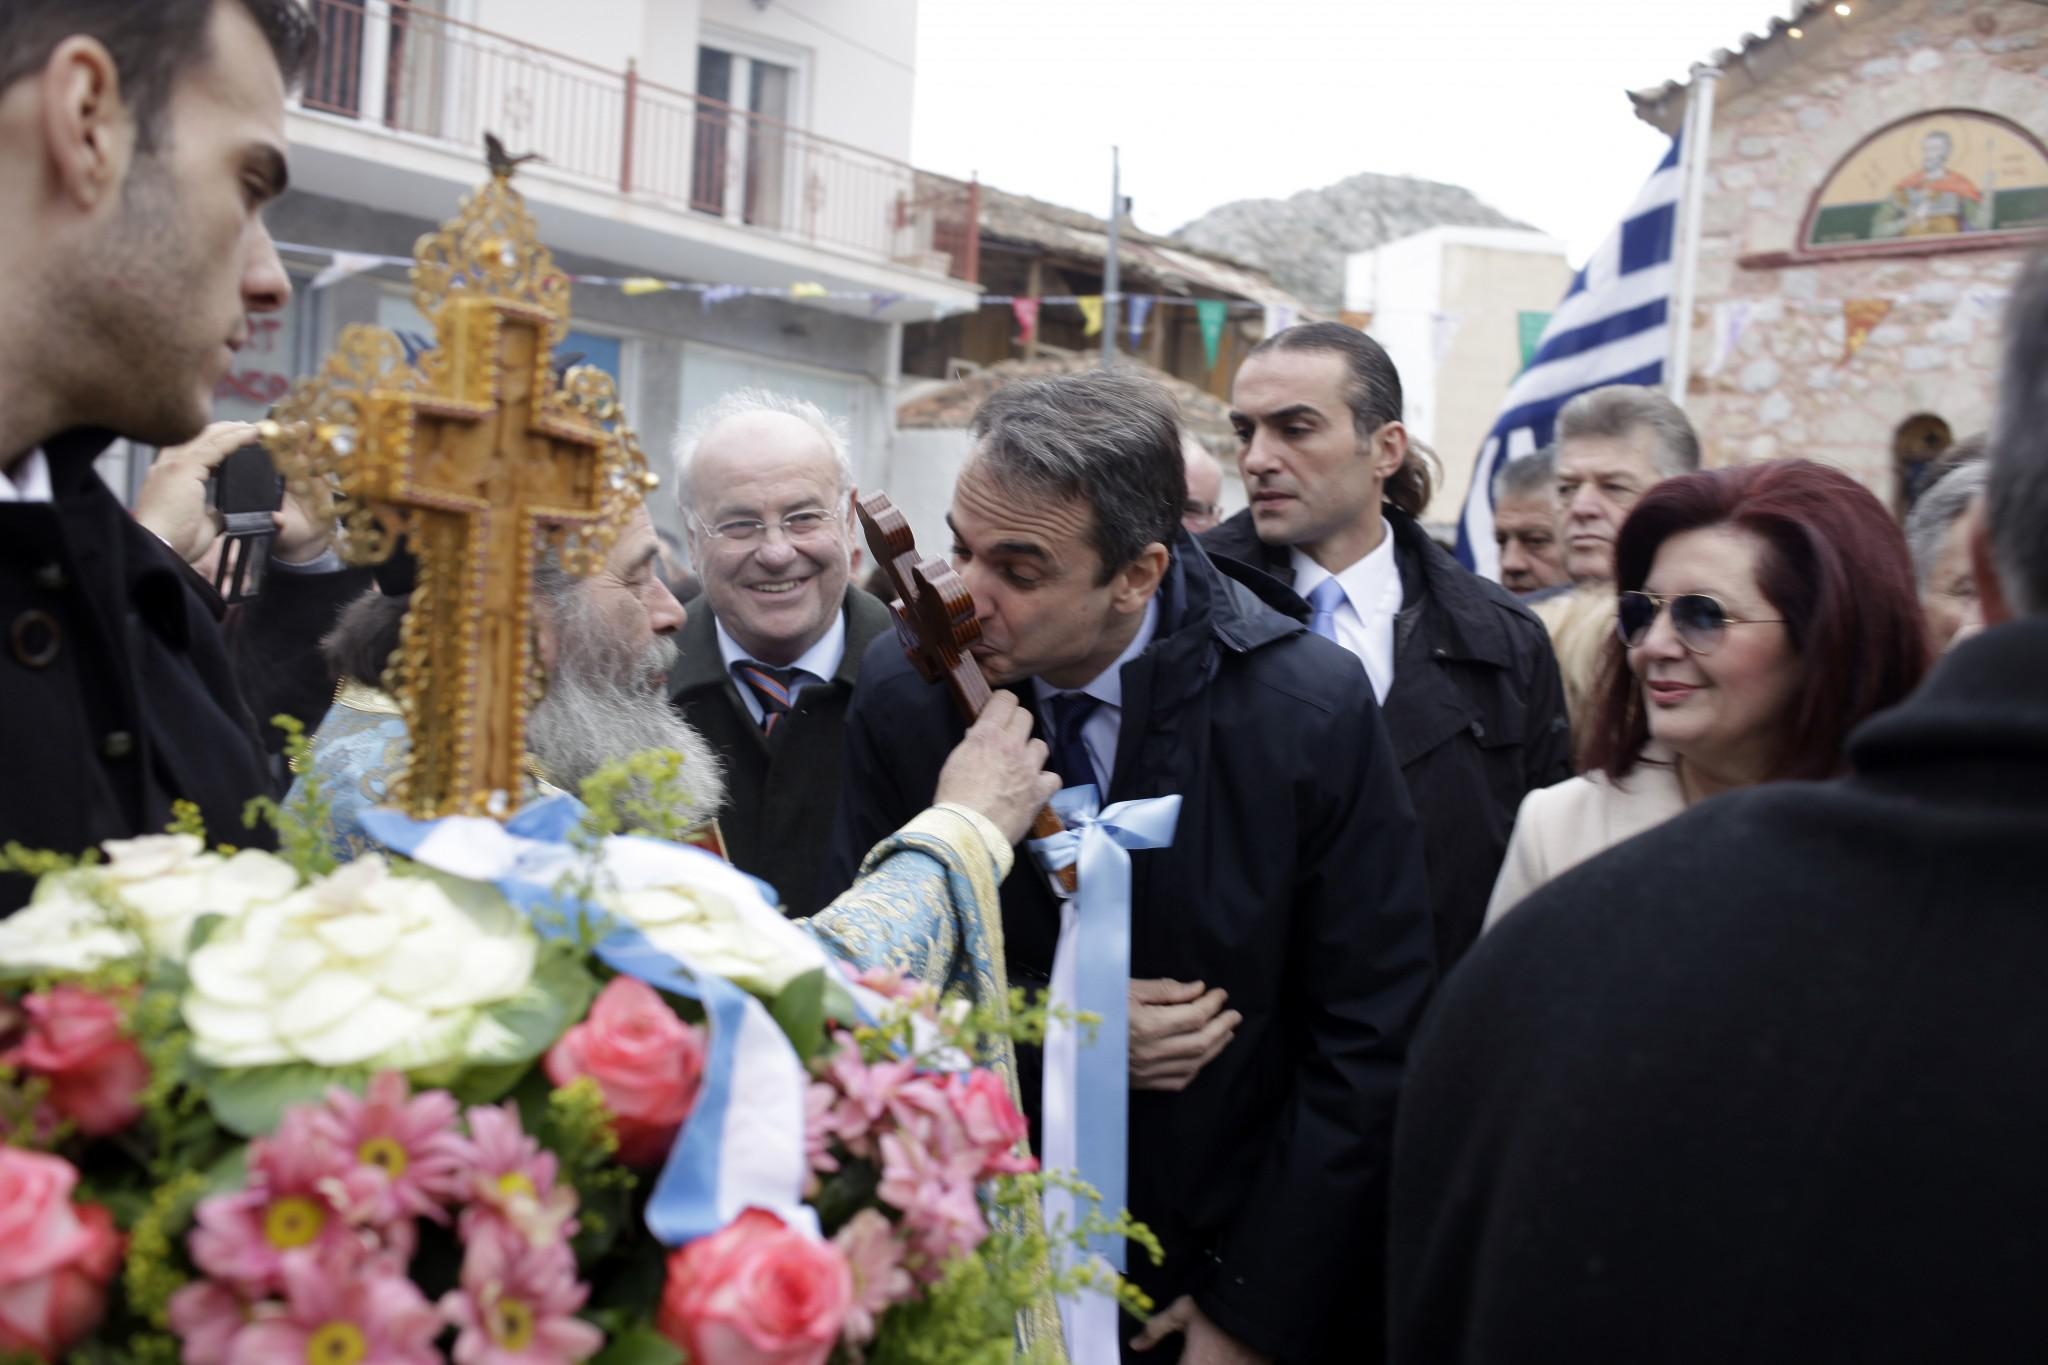 mitsotakis1-500 Μητσοτάκης: Είναι άμεση η ανάγκη για ενότητα [εικόνες]